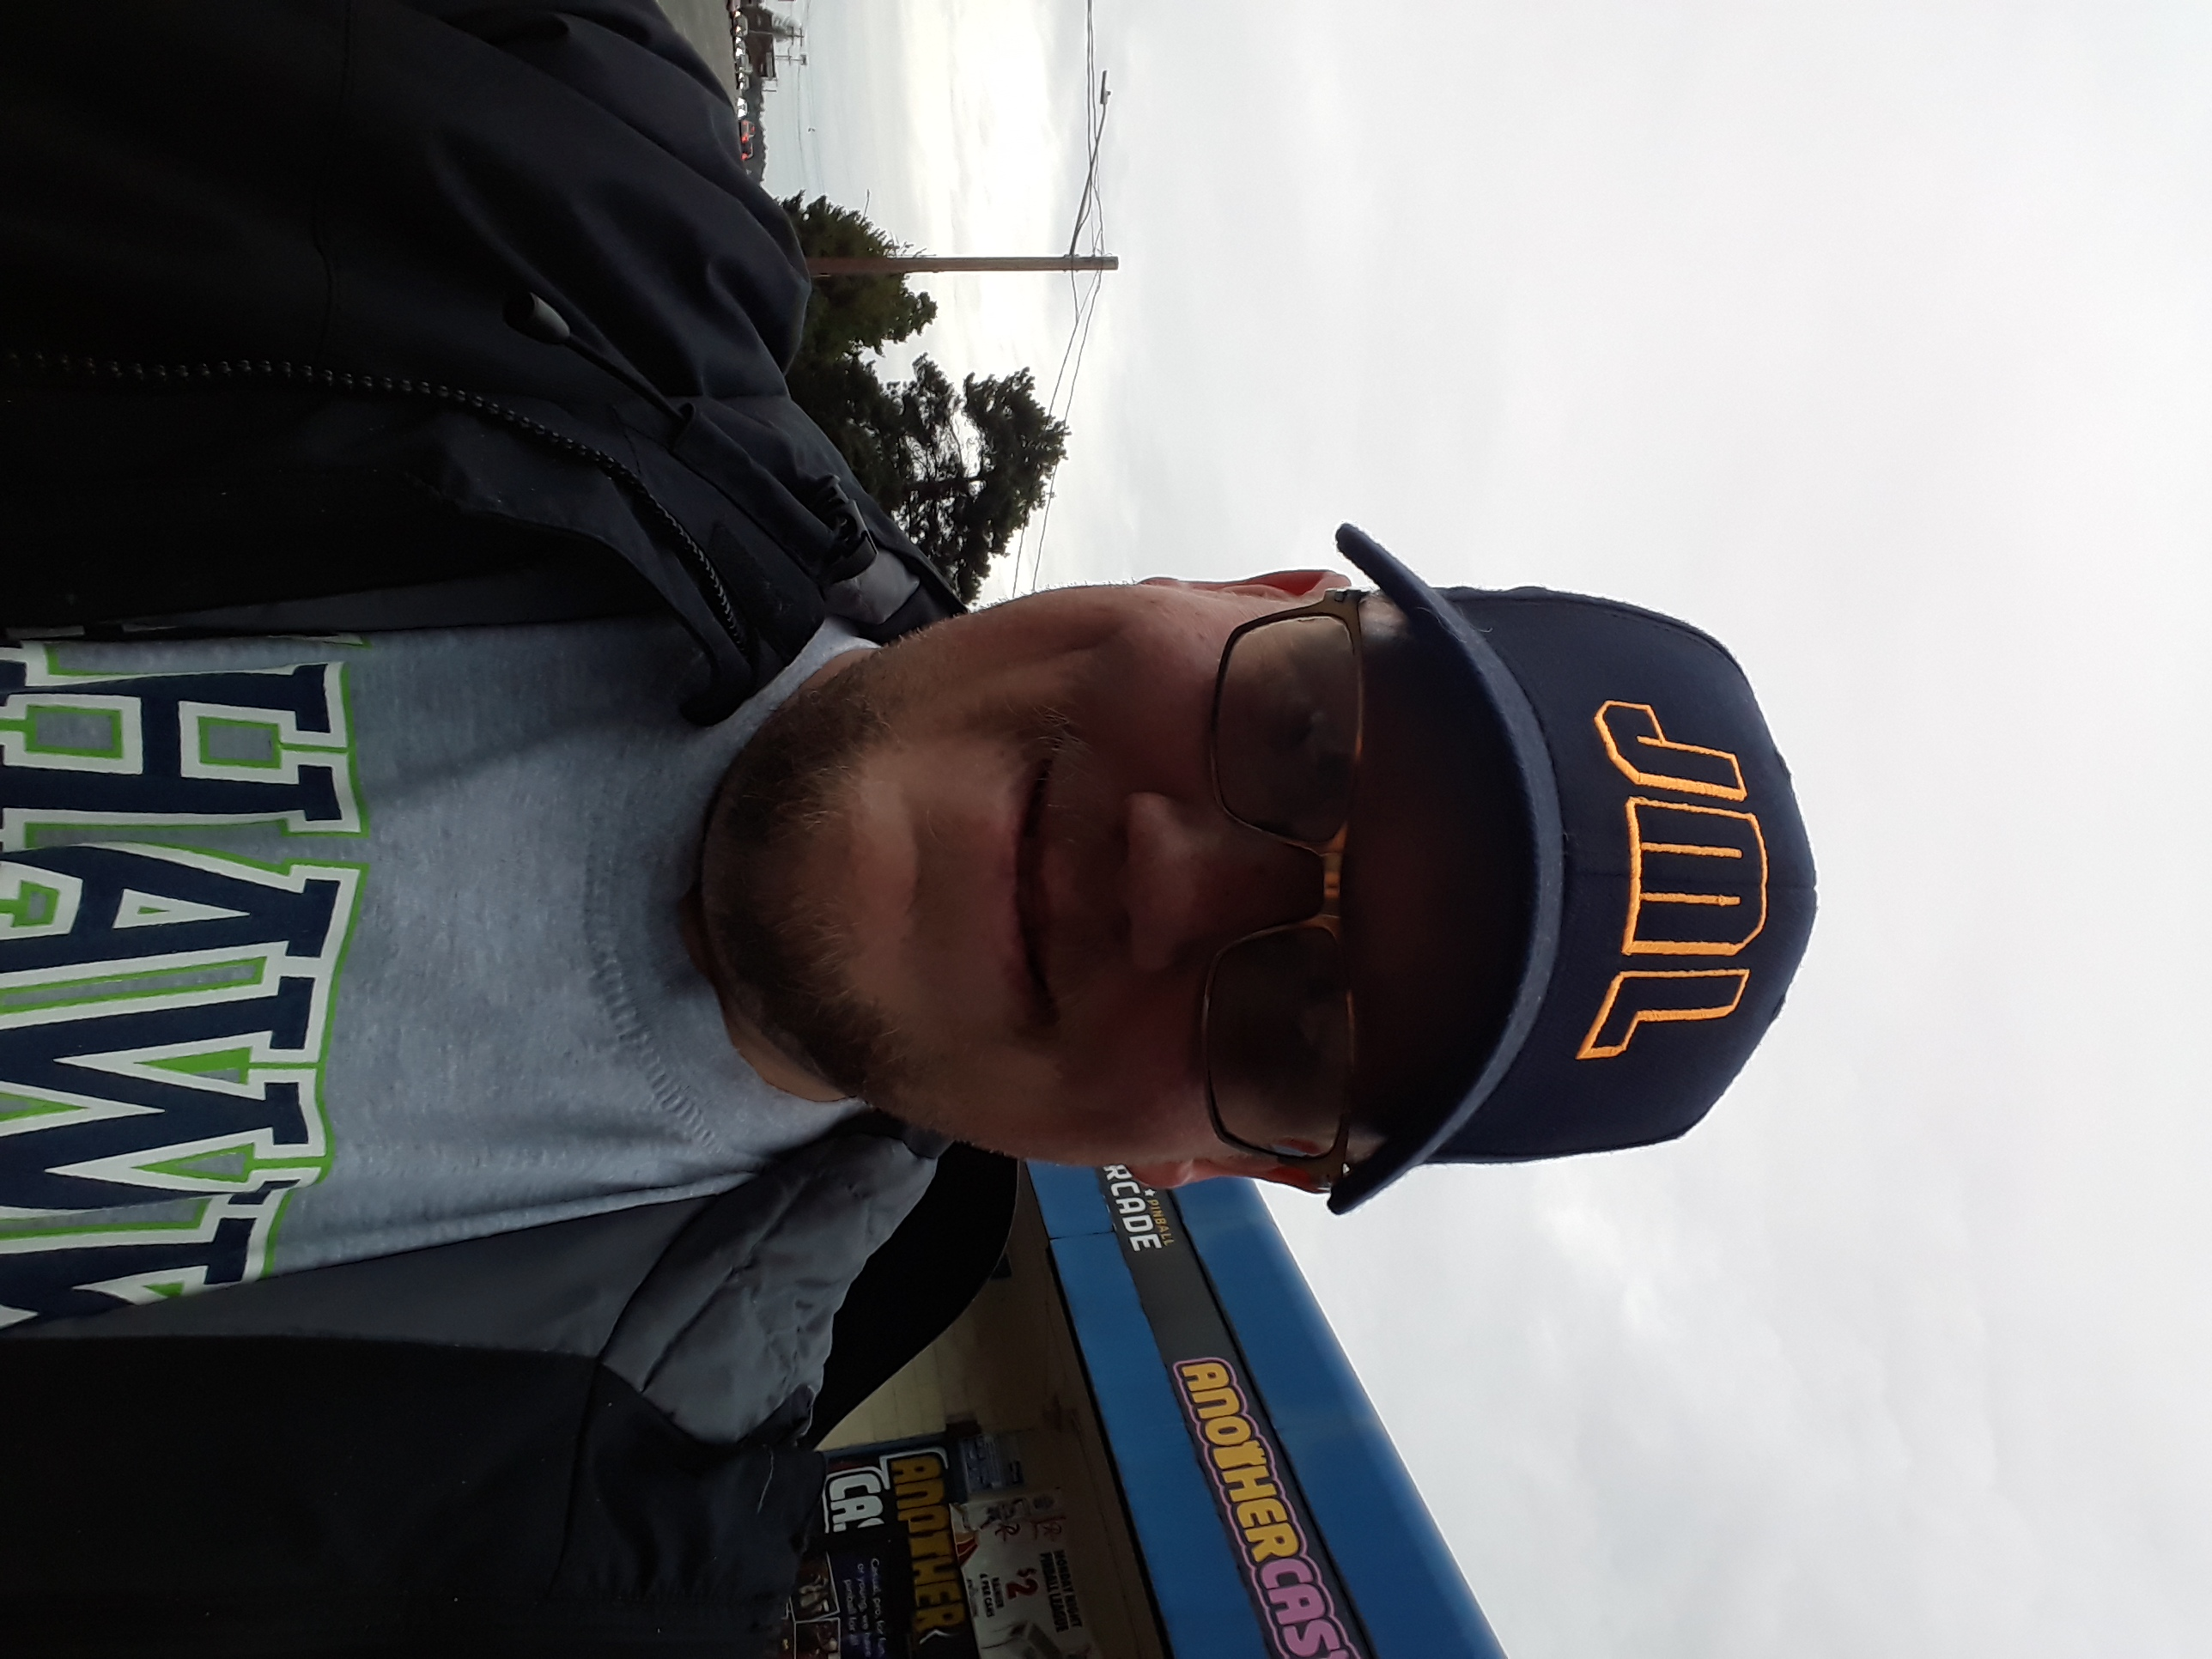 JML101582: The Munsters [L.E.] (Pinball: 3 Balls) 410,240 points on 2019-12-28 17:07:15